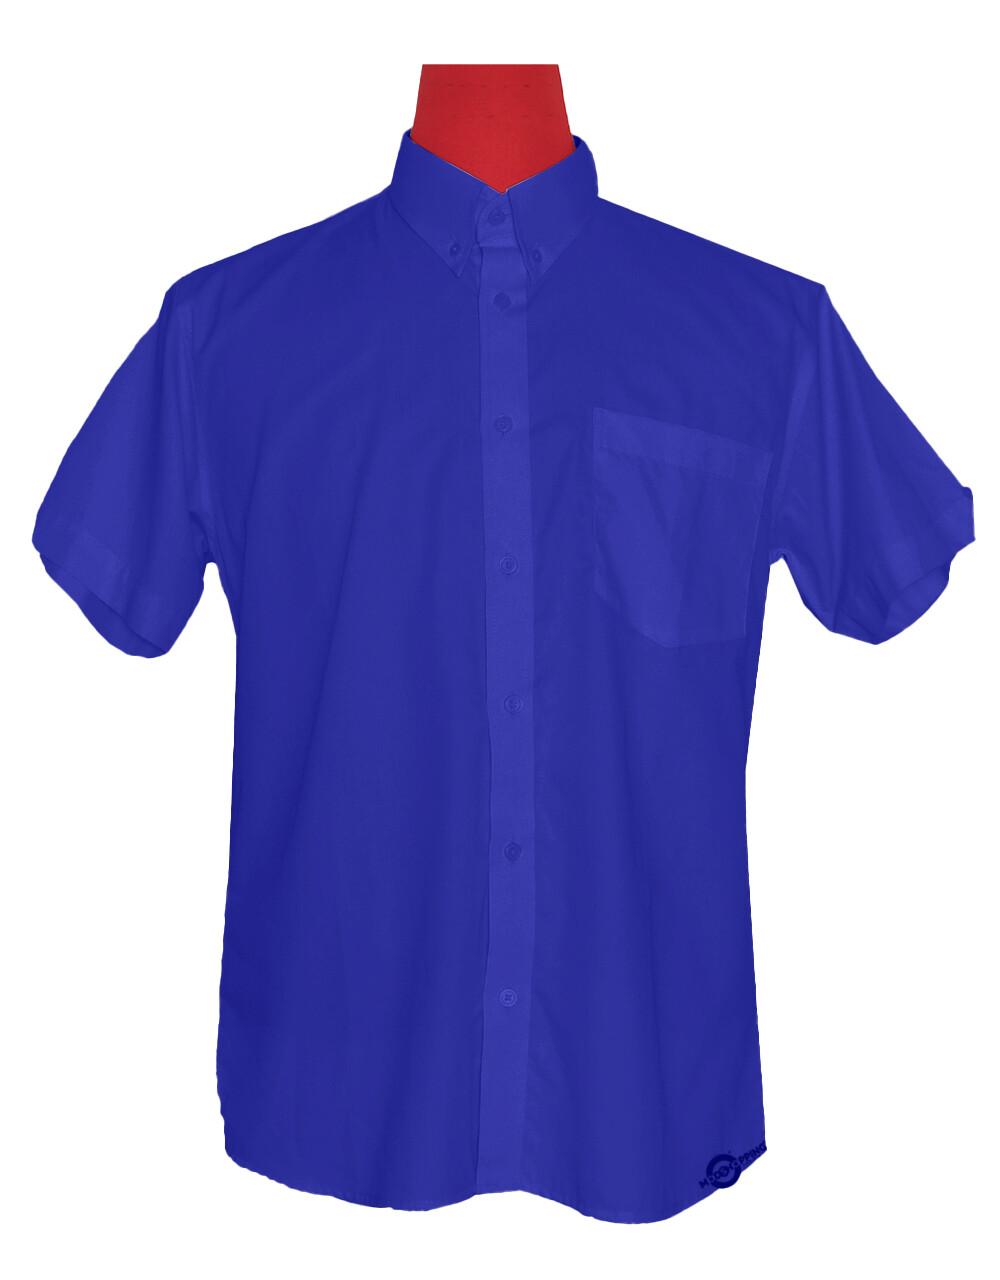 Short-Sleeve Shirt | 60S Mod Style Blue Color Shirt For Man